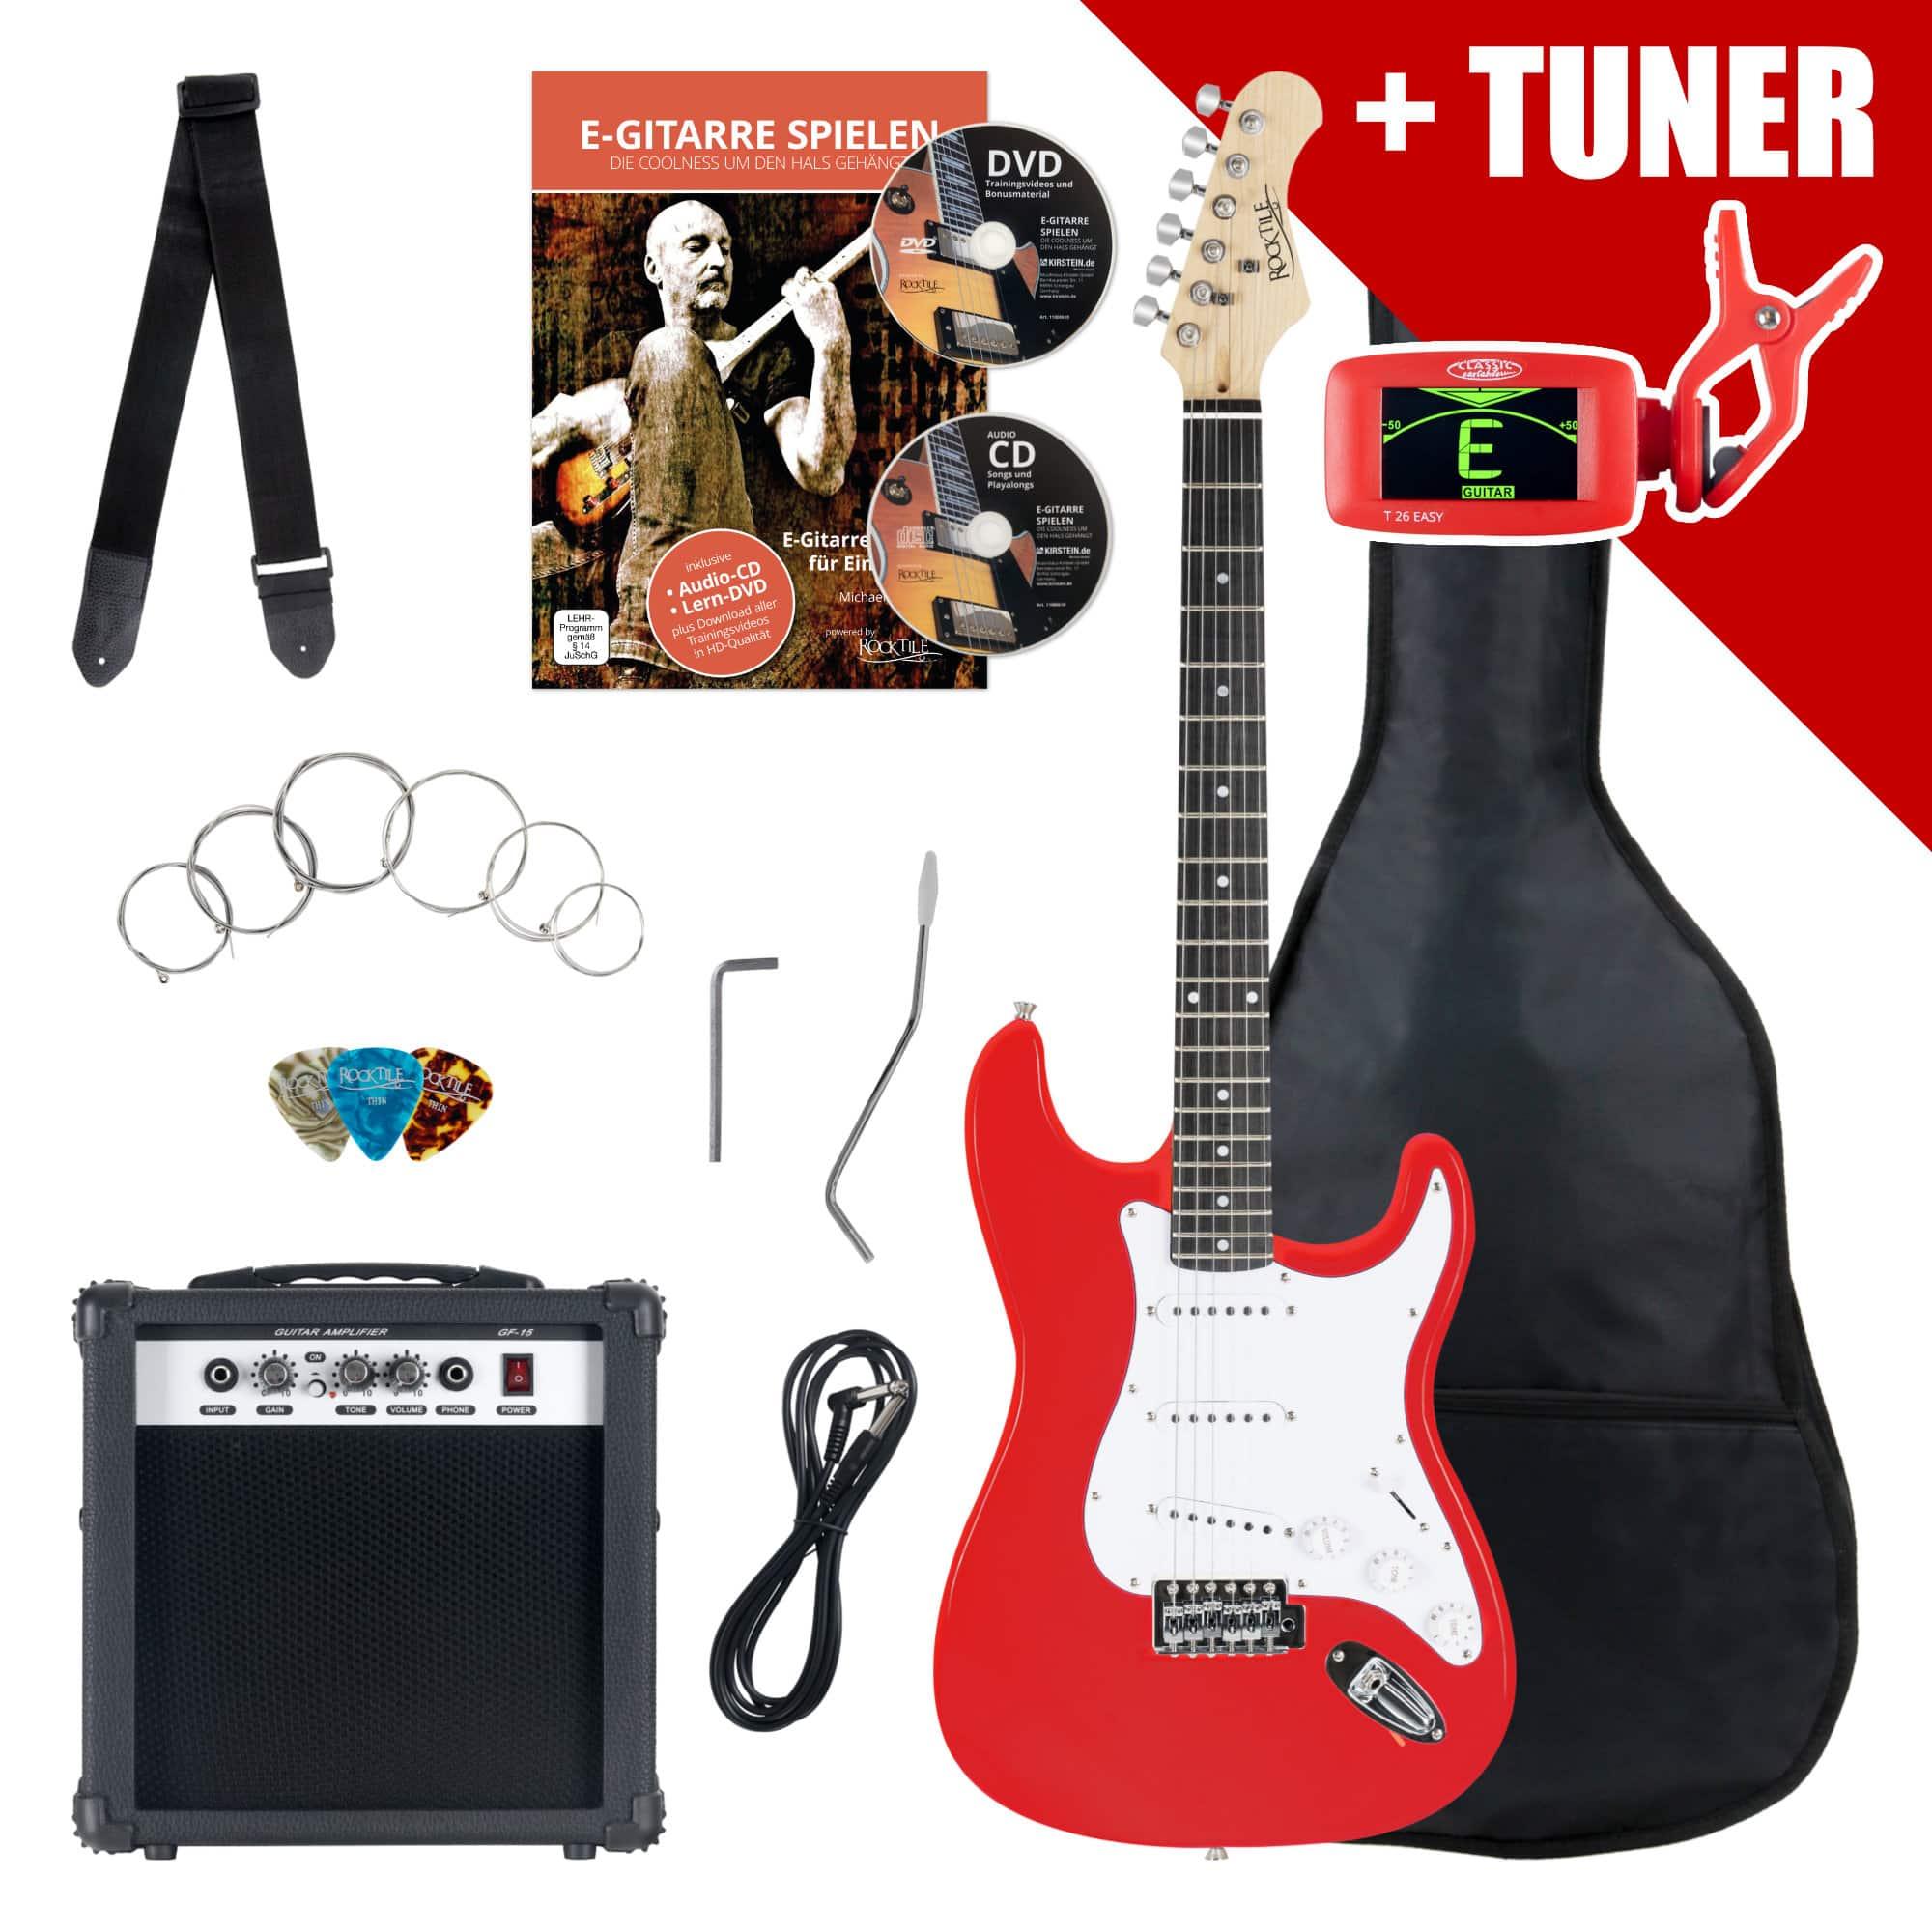 Rocktile ST Pack E Gitarre Set Red inkl. Verstärker, Tasche, Stimmgerät, Kabel, Gurt, Saiten und Schule inkl. CD|DVD